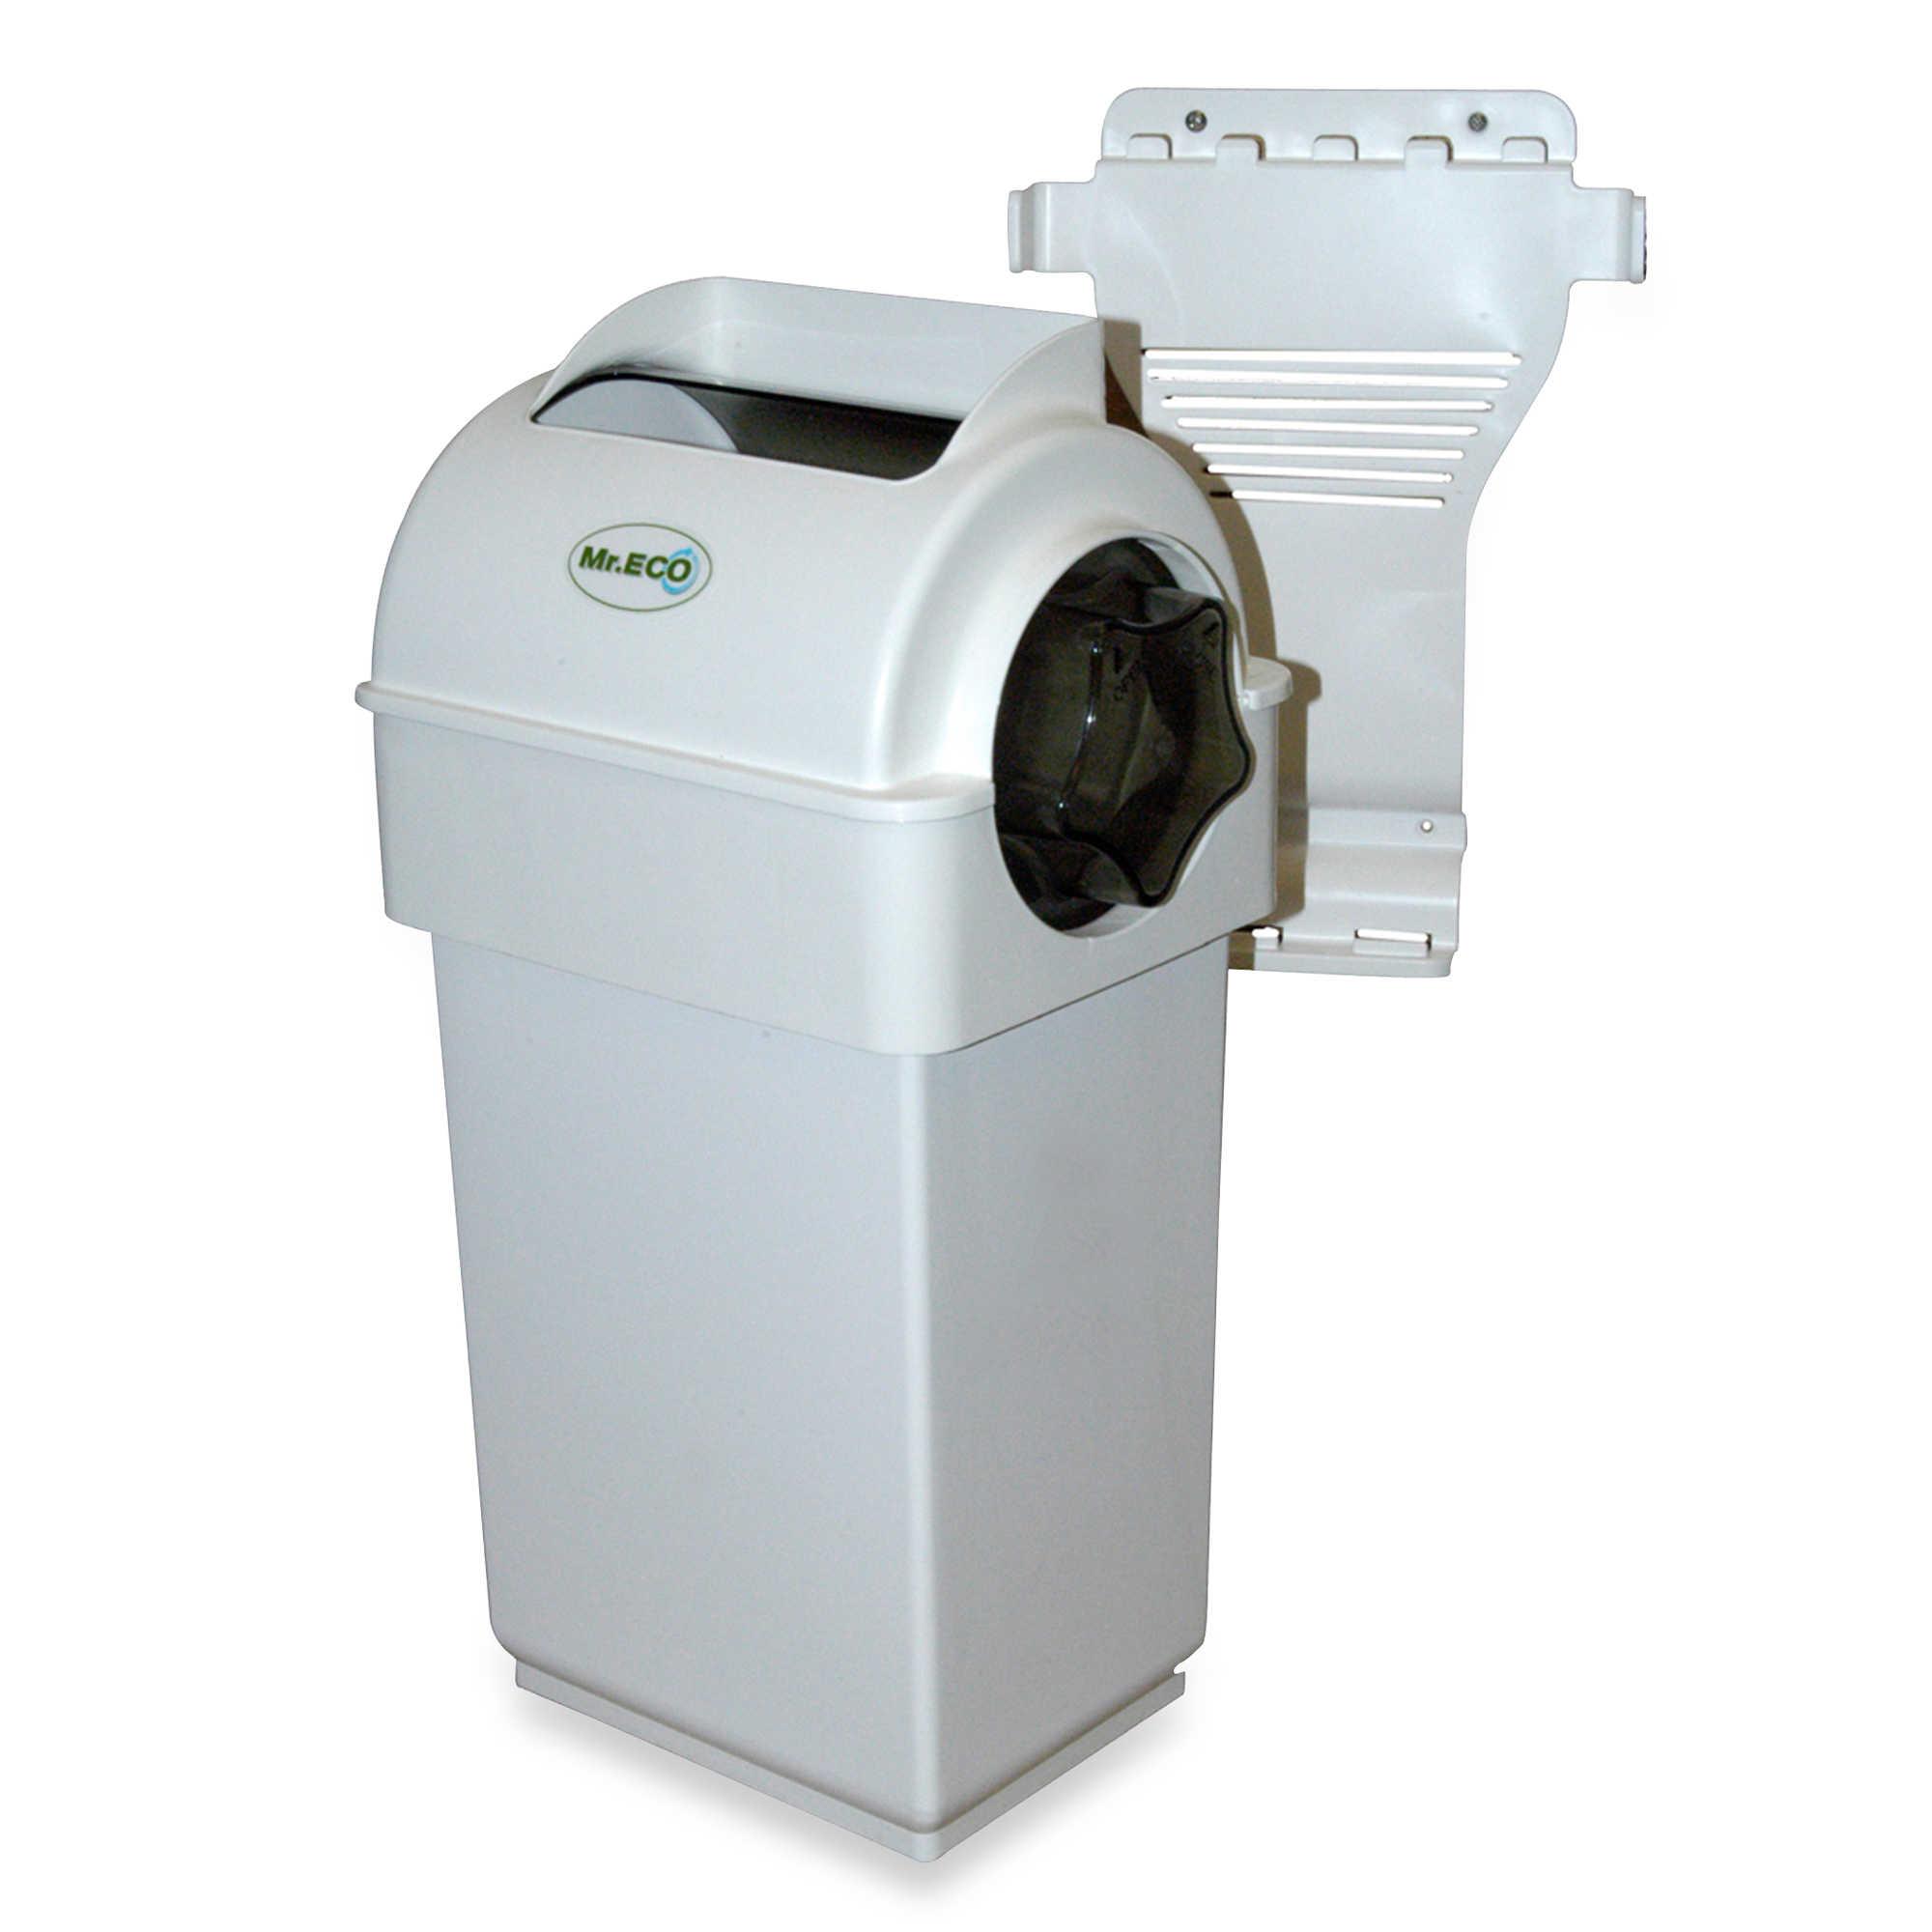 Mr. ECO Kitchen Composter